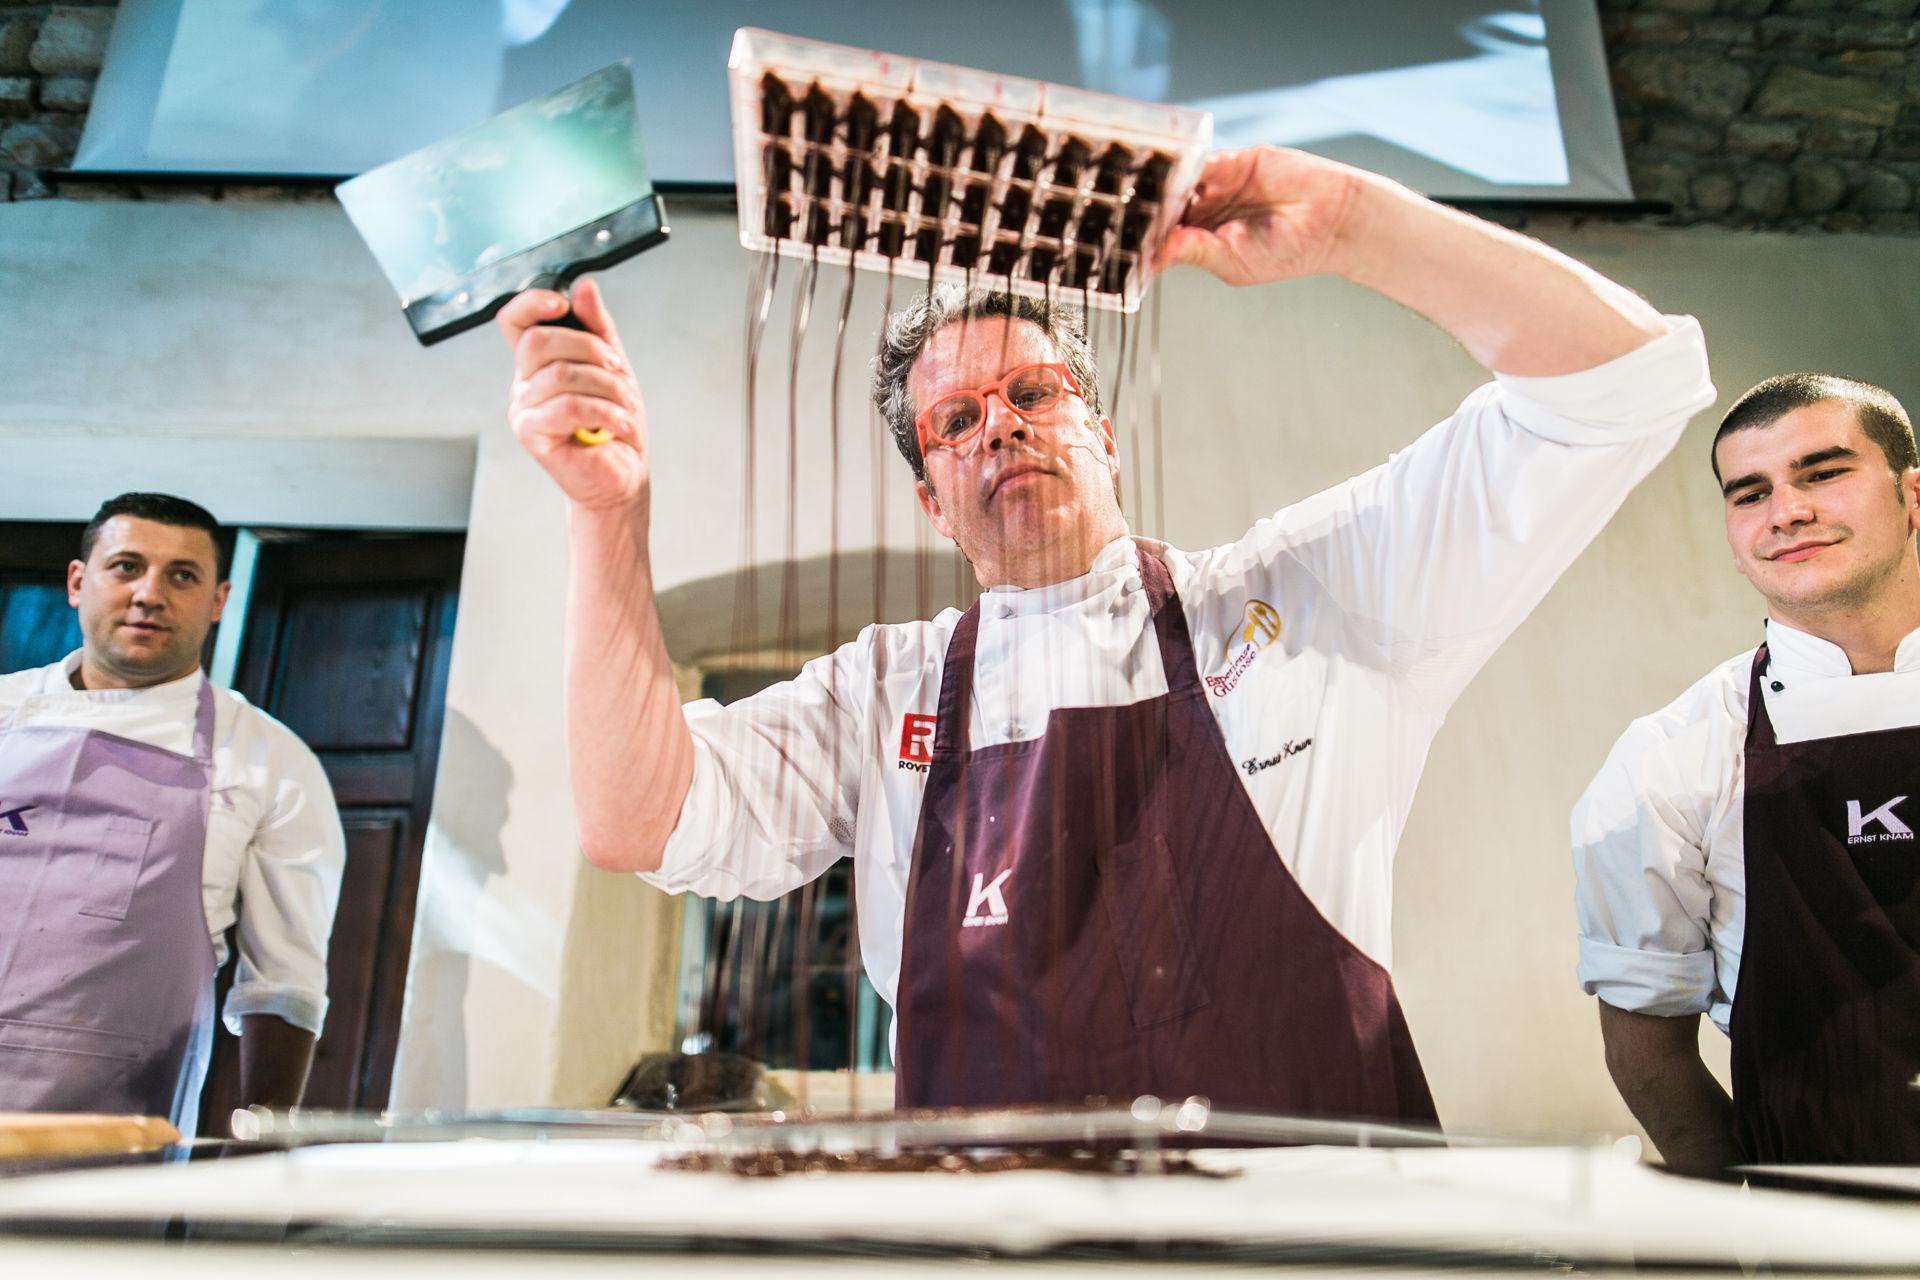 Ernst Knam pasticcere chef